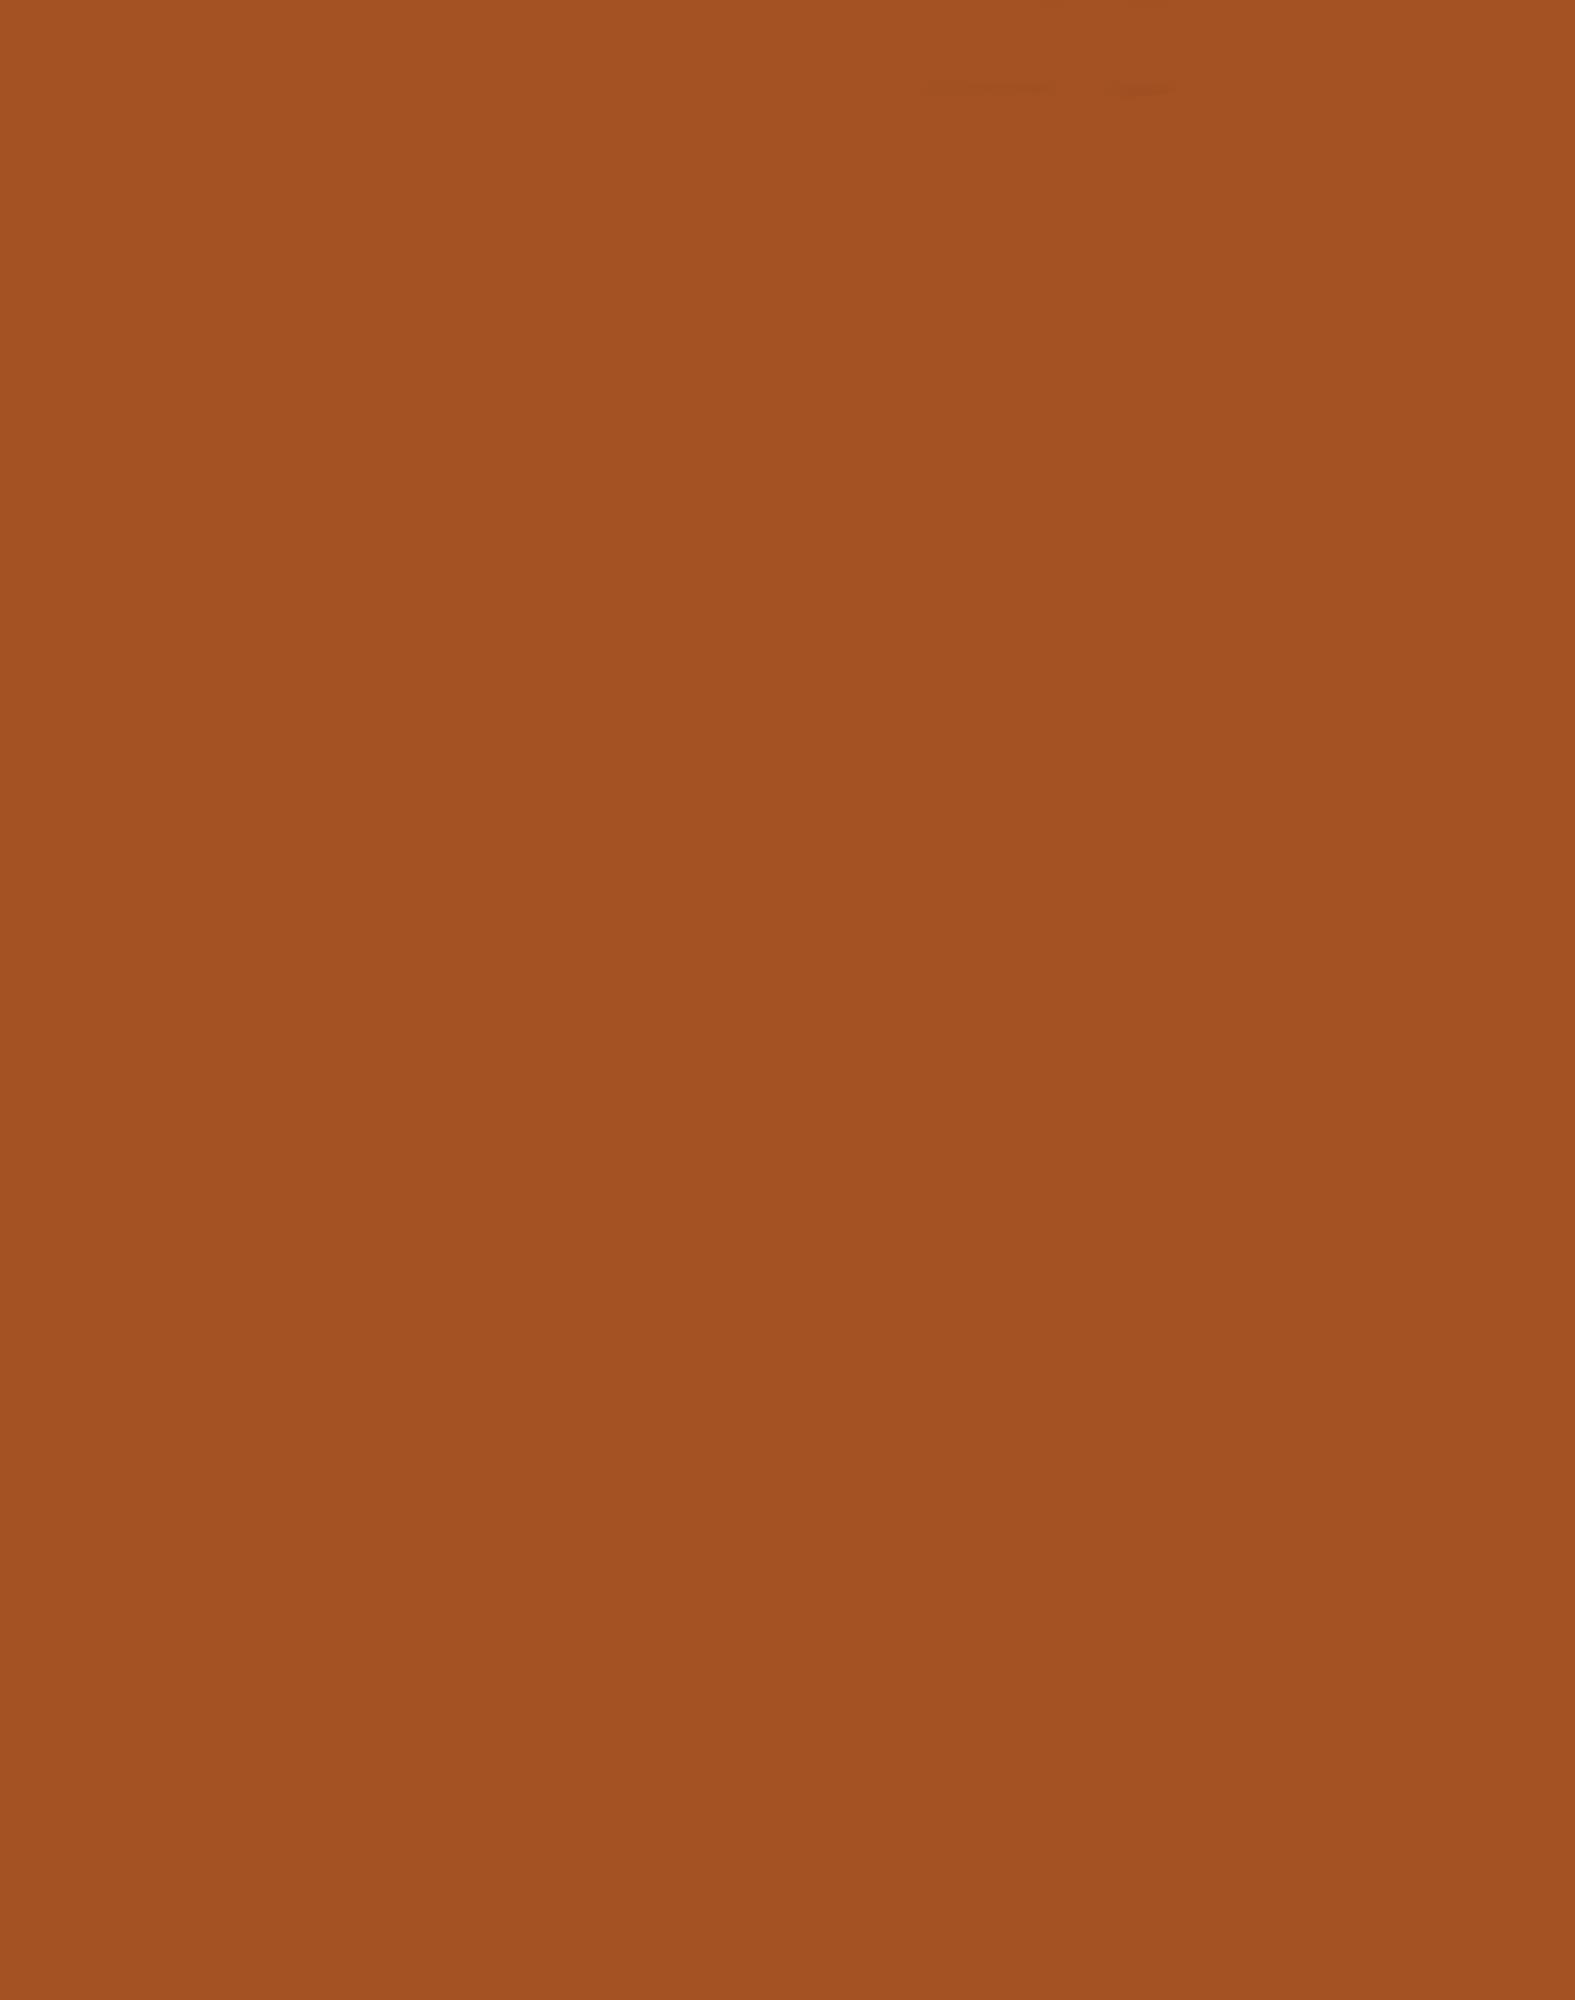 (Woodcare) Country Cedar 164,82,35